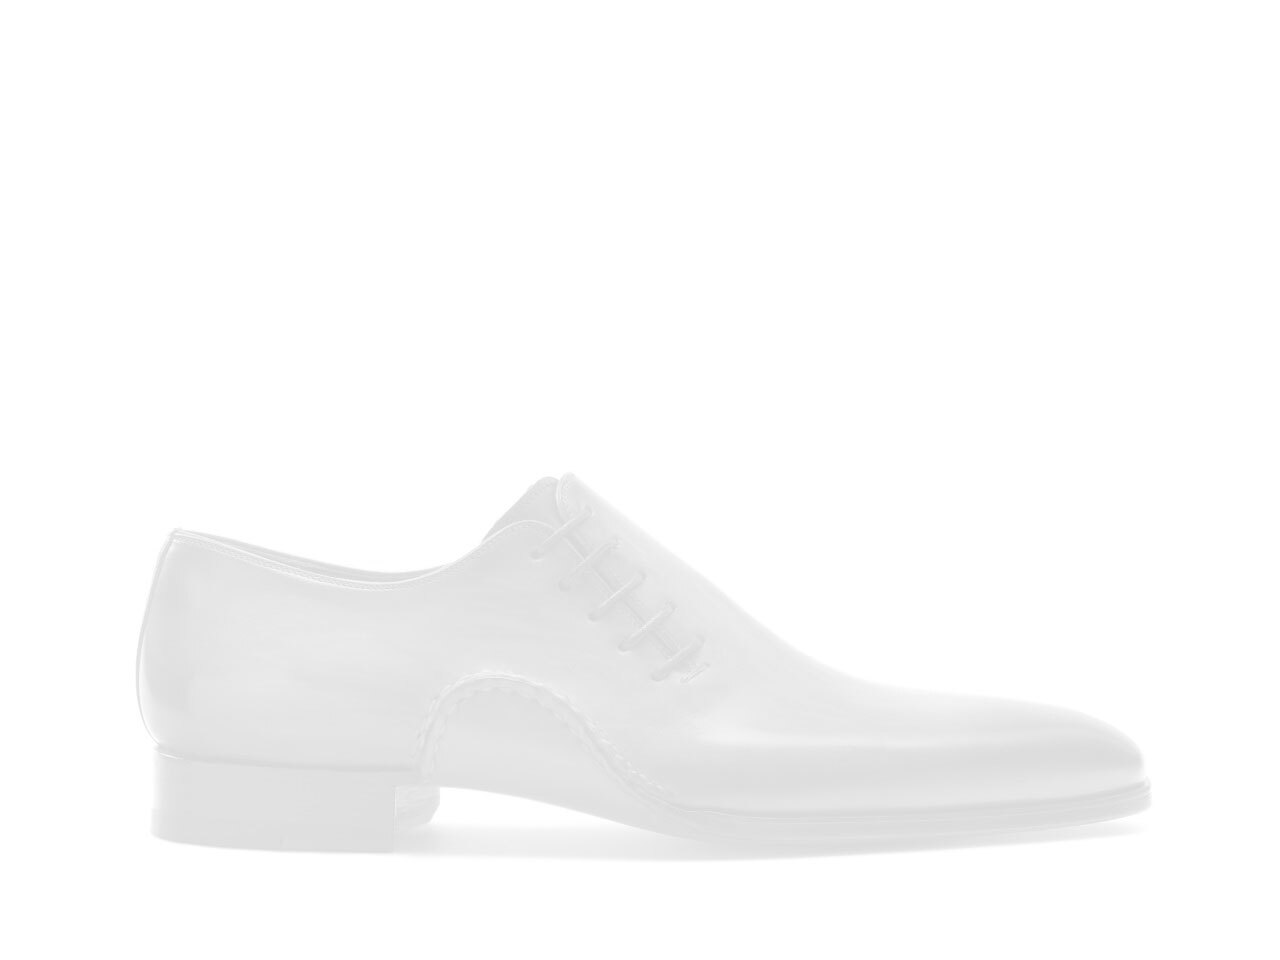 Sole of the Magnanni Aranga Grafito Men's Oxford Shoes